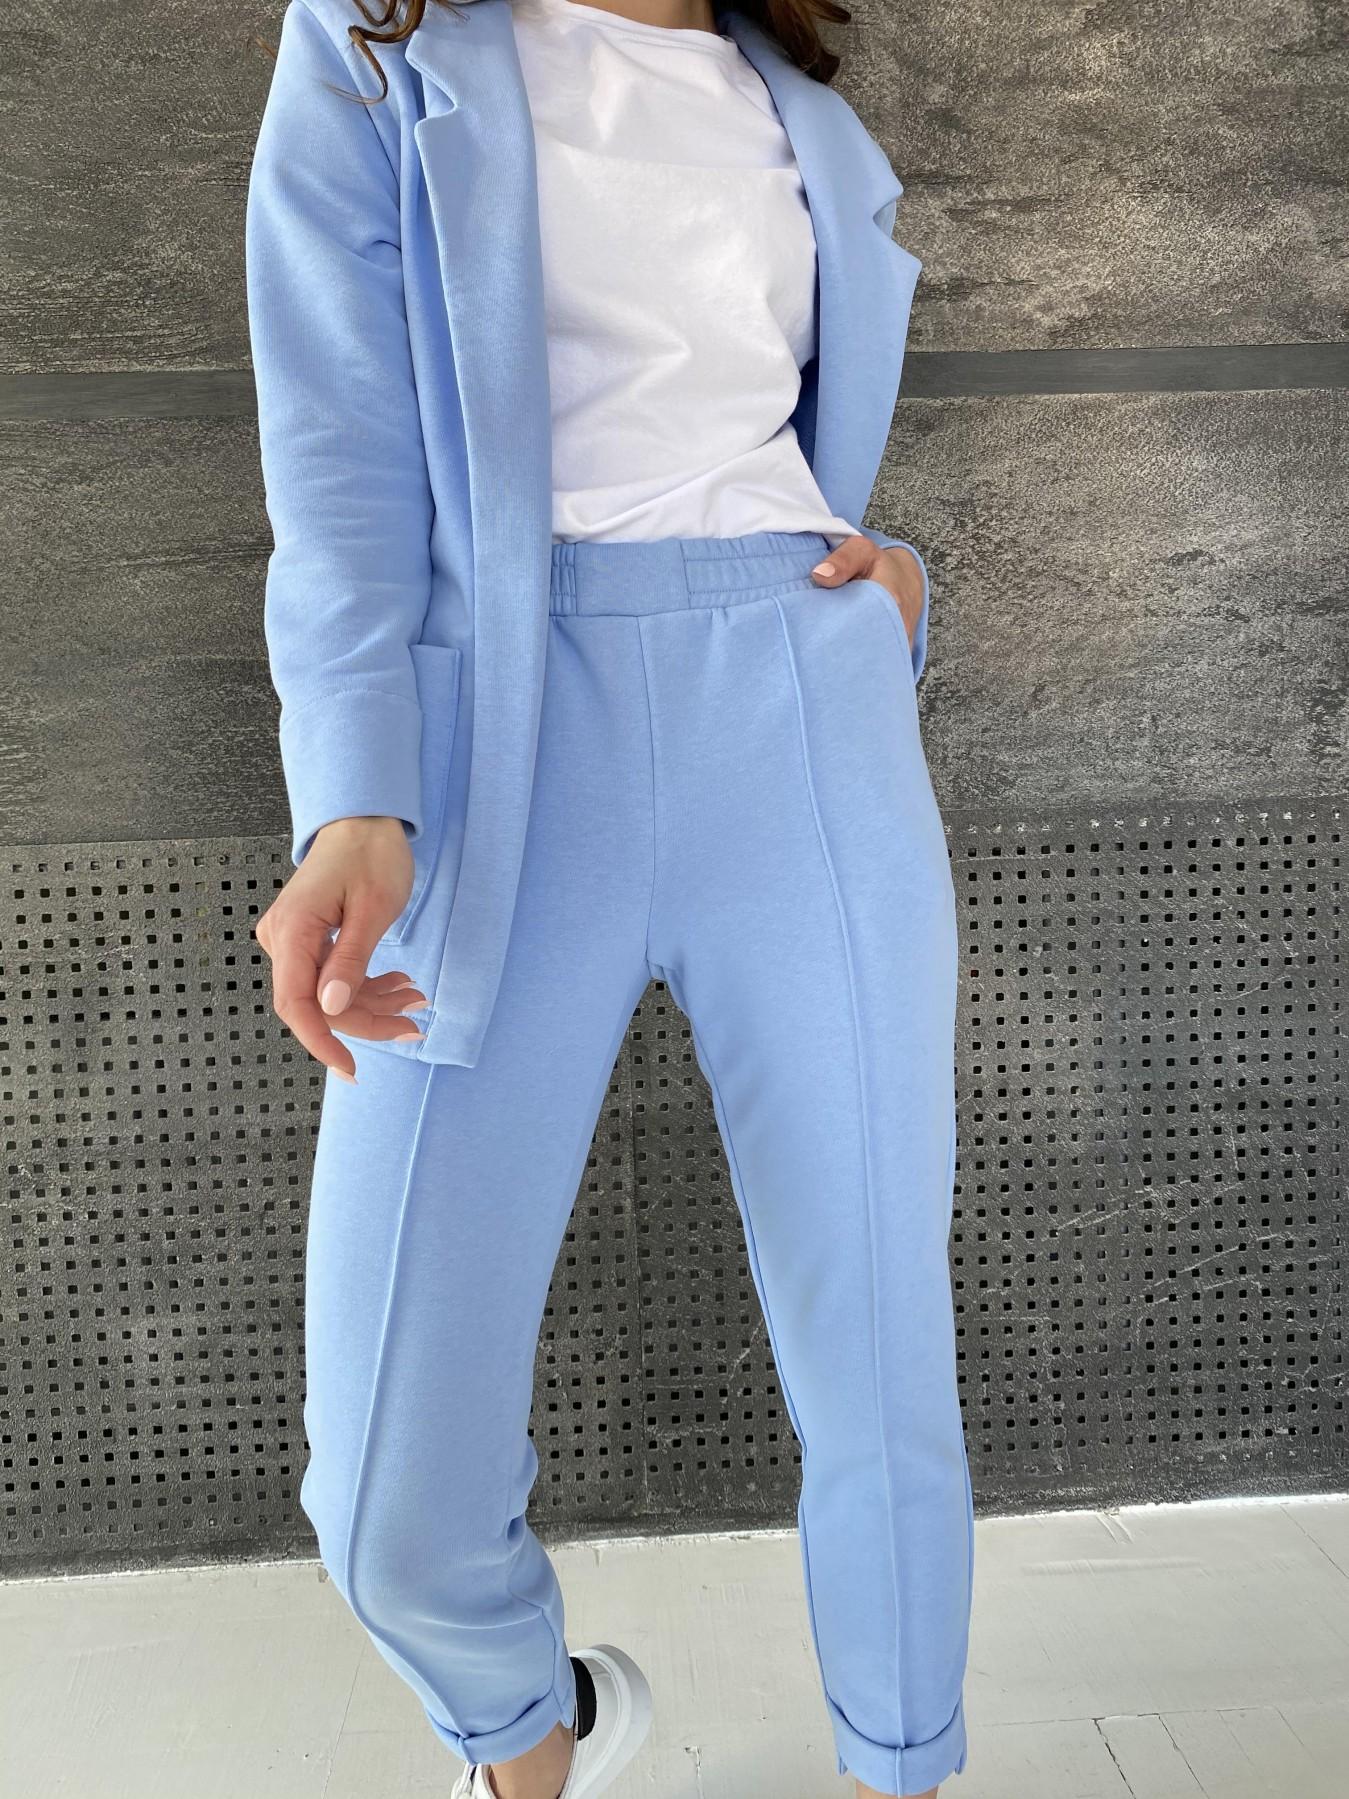 Аурис костюм трикотажный из  3х нитки 11083 АРТ. 47577 Цвет: Голубой - фото 2, интернет магазин tm-modus.ru